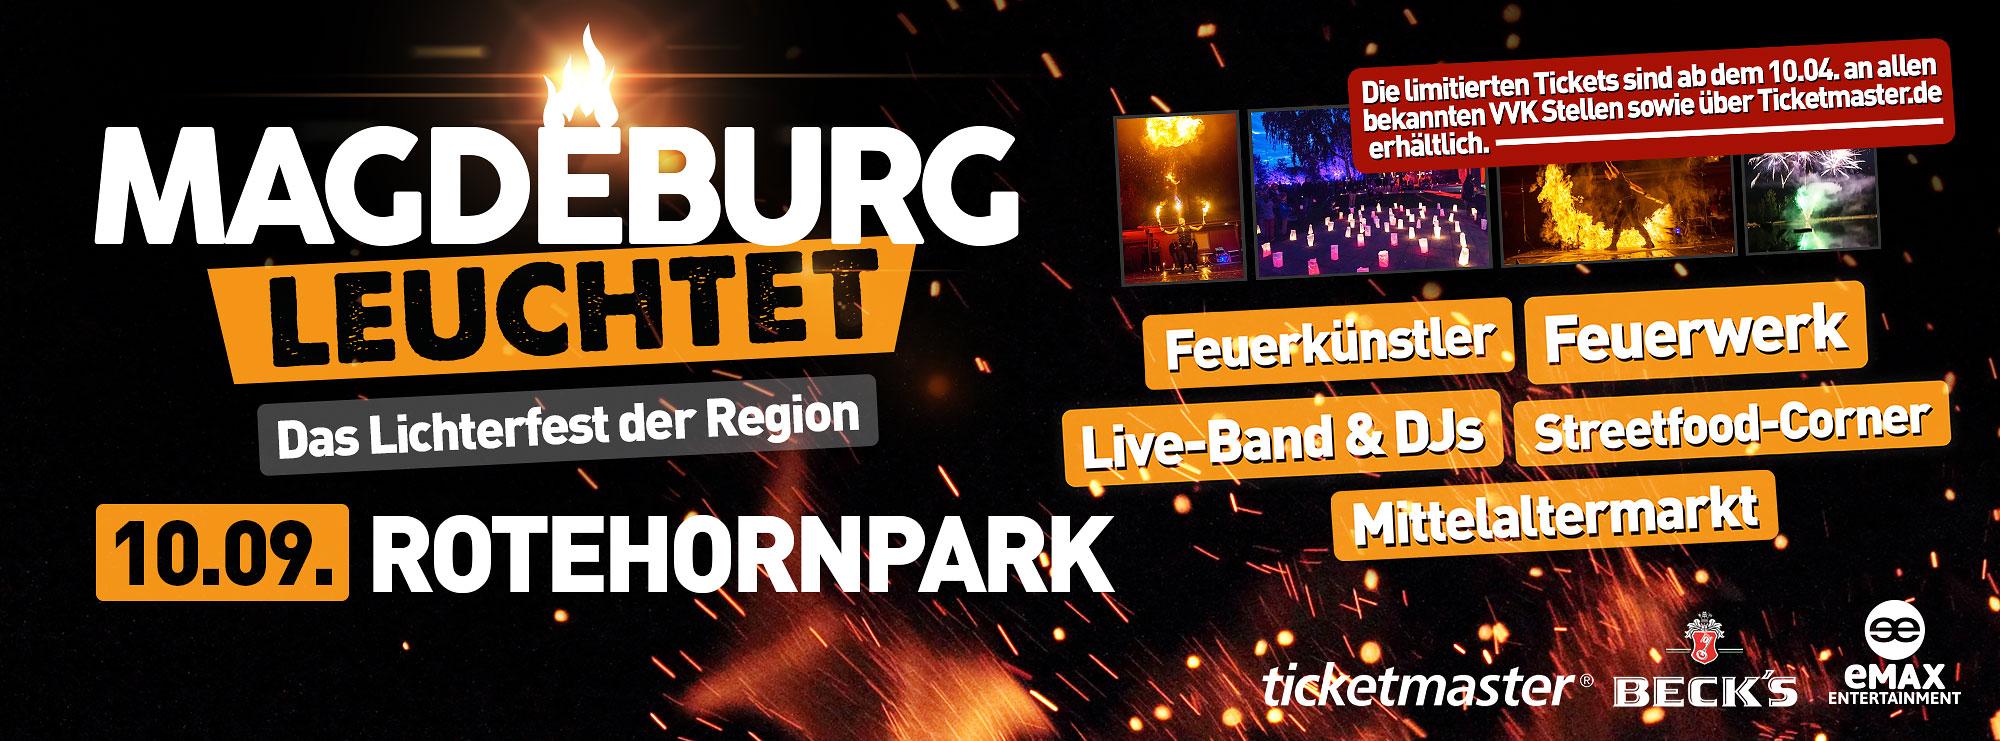 Magdeburg_banner_homepage